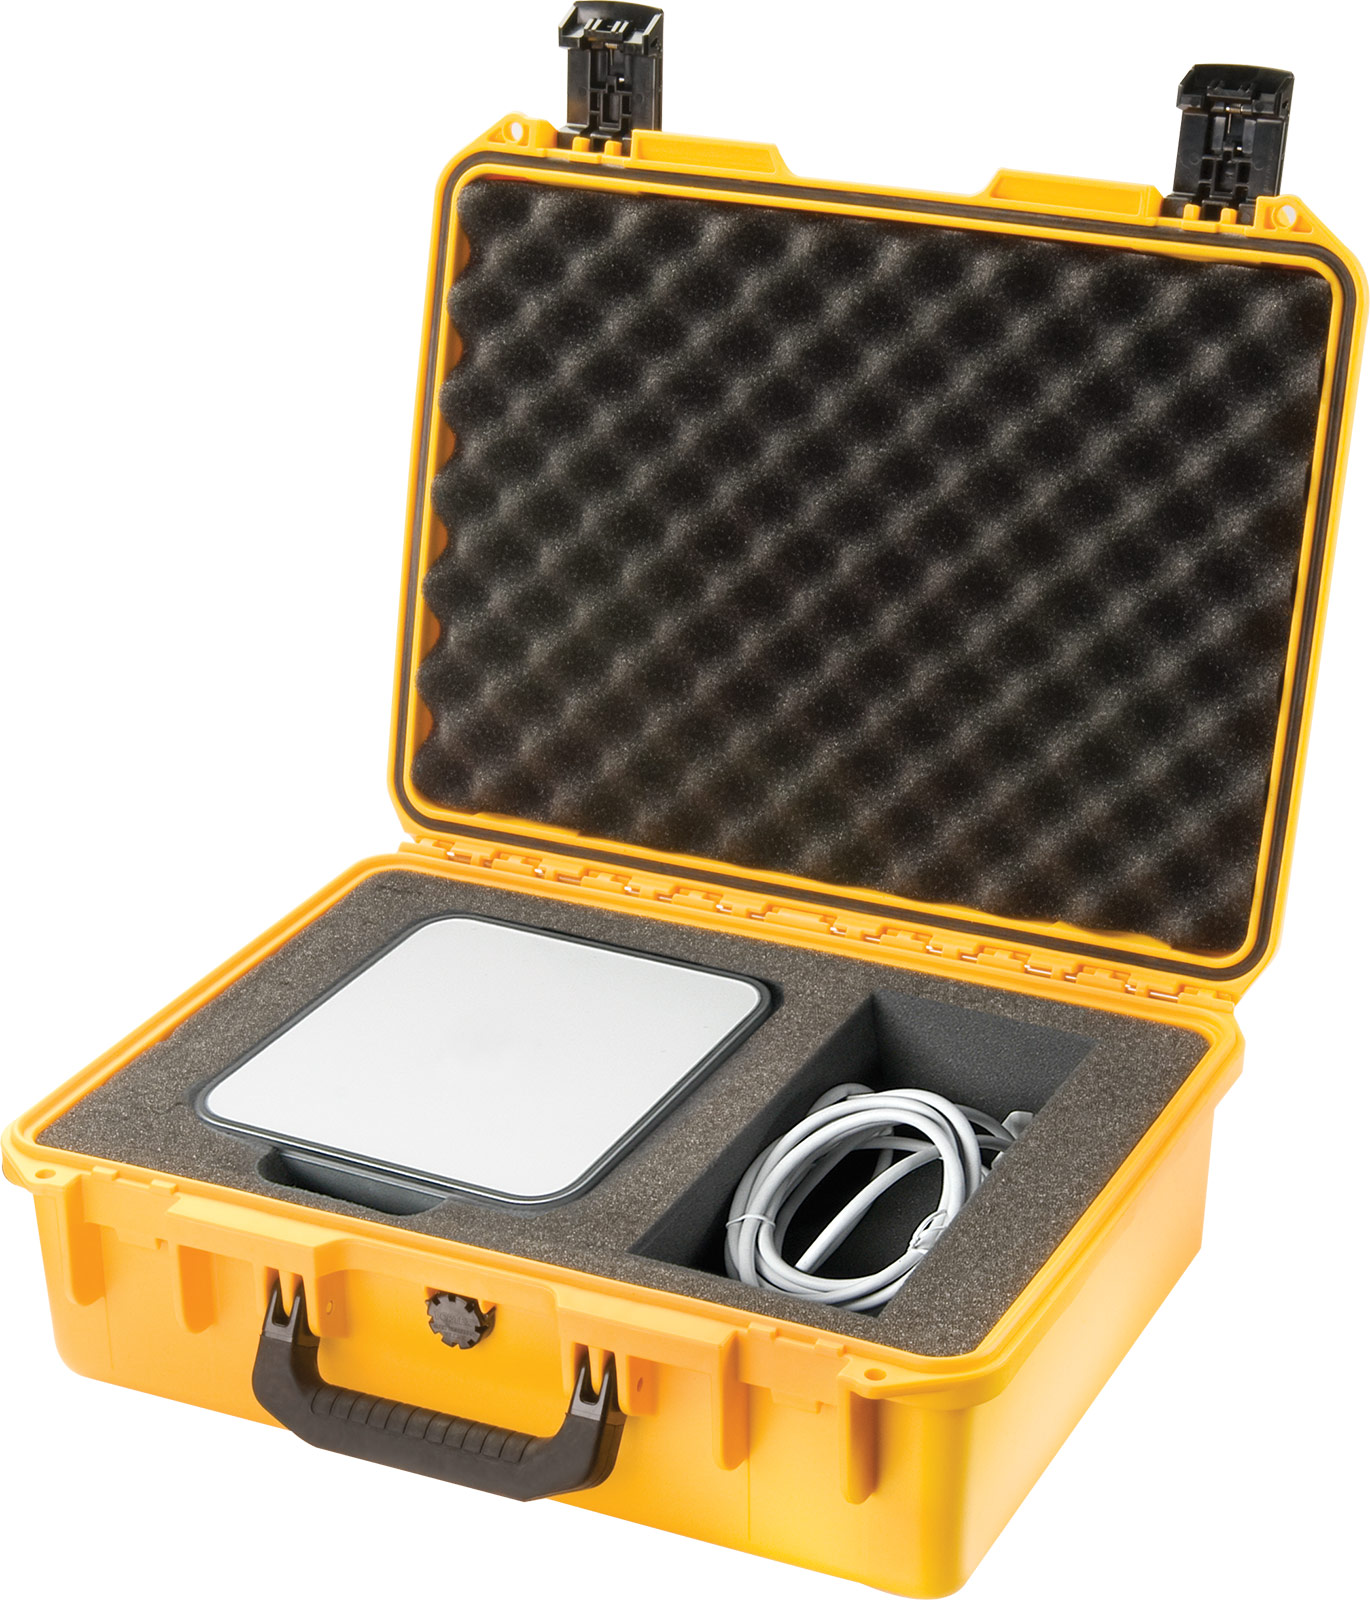 pelican im2400 apple hard drive case